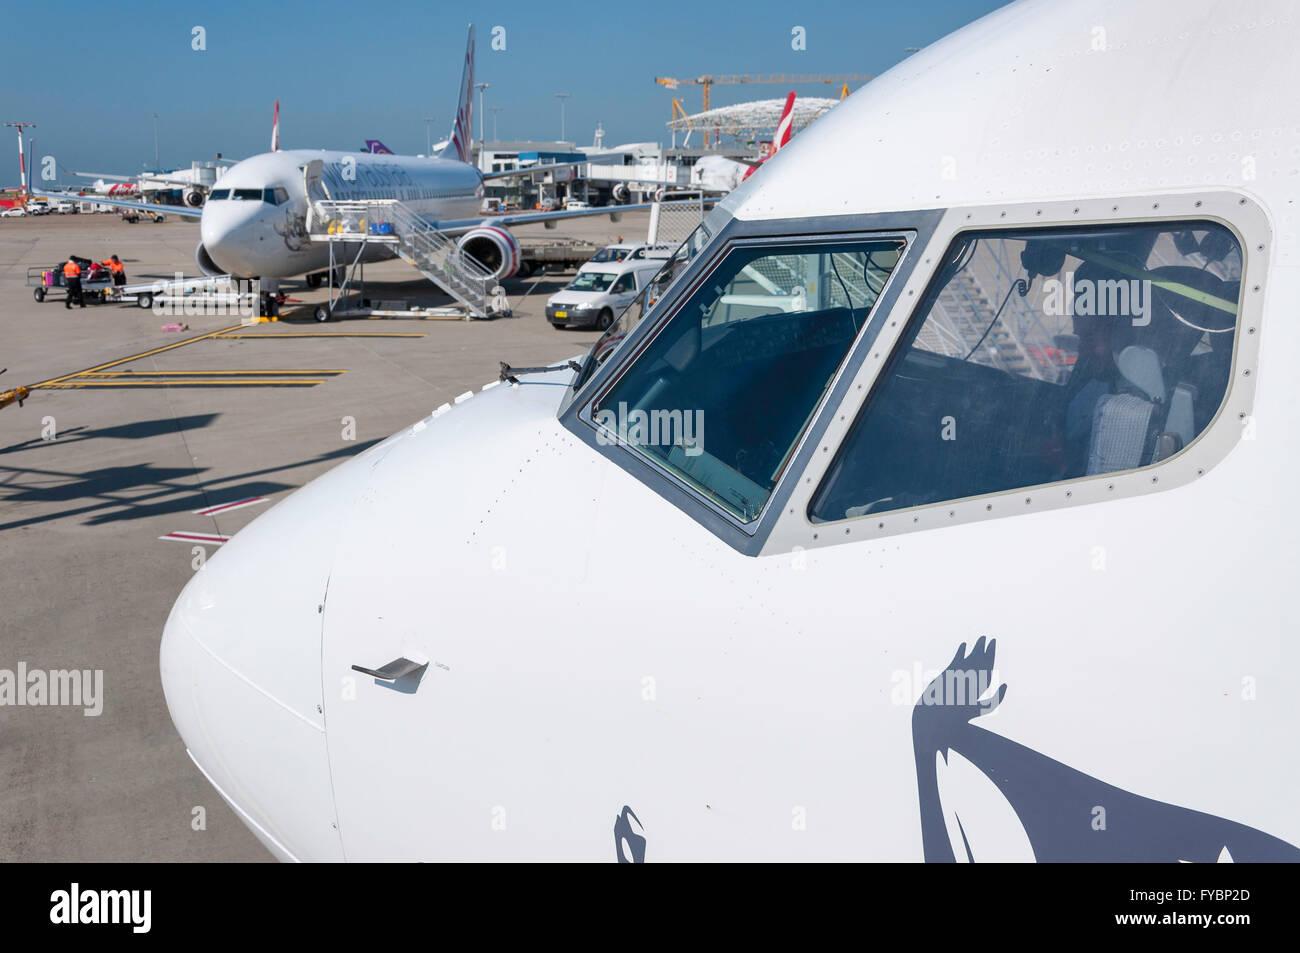 Aircraft on tarmac at Sydney Kingsford Smith Airport, Mascot, Sydney, New South Wales, Australia - Stock Image